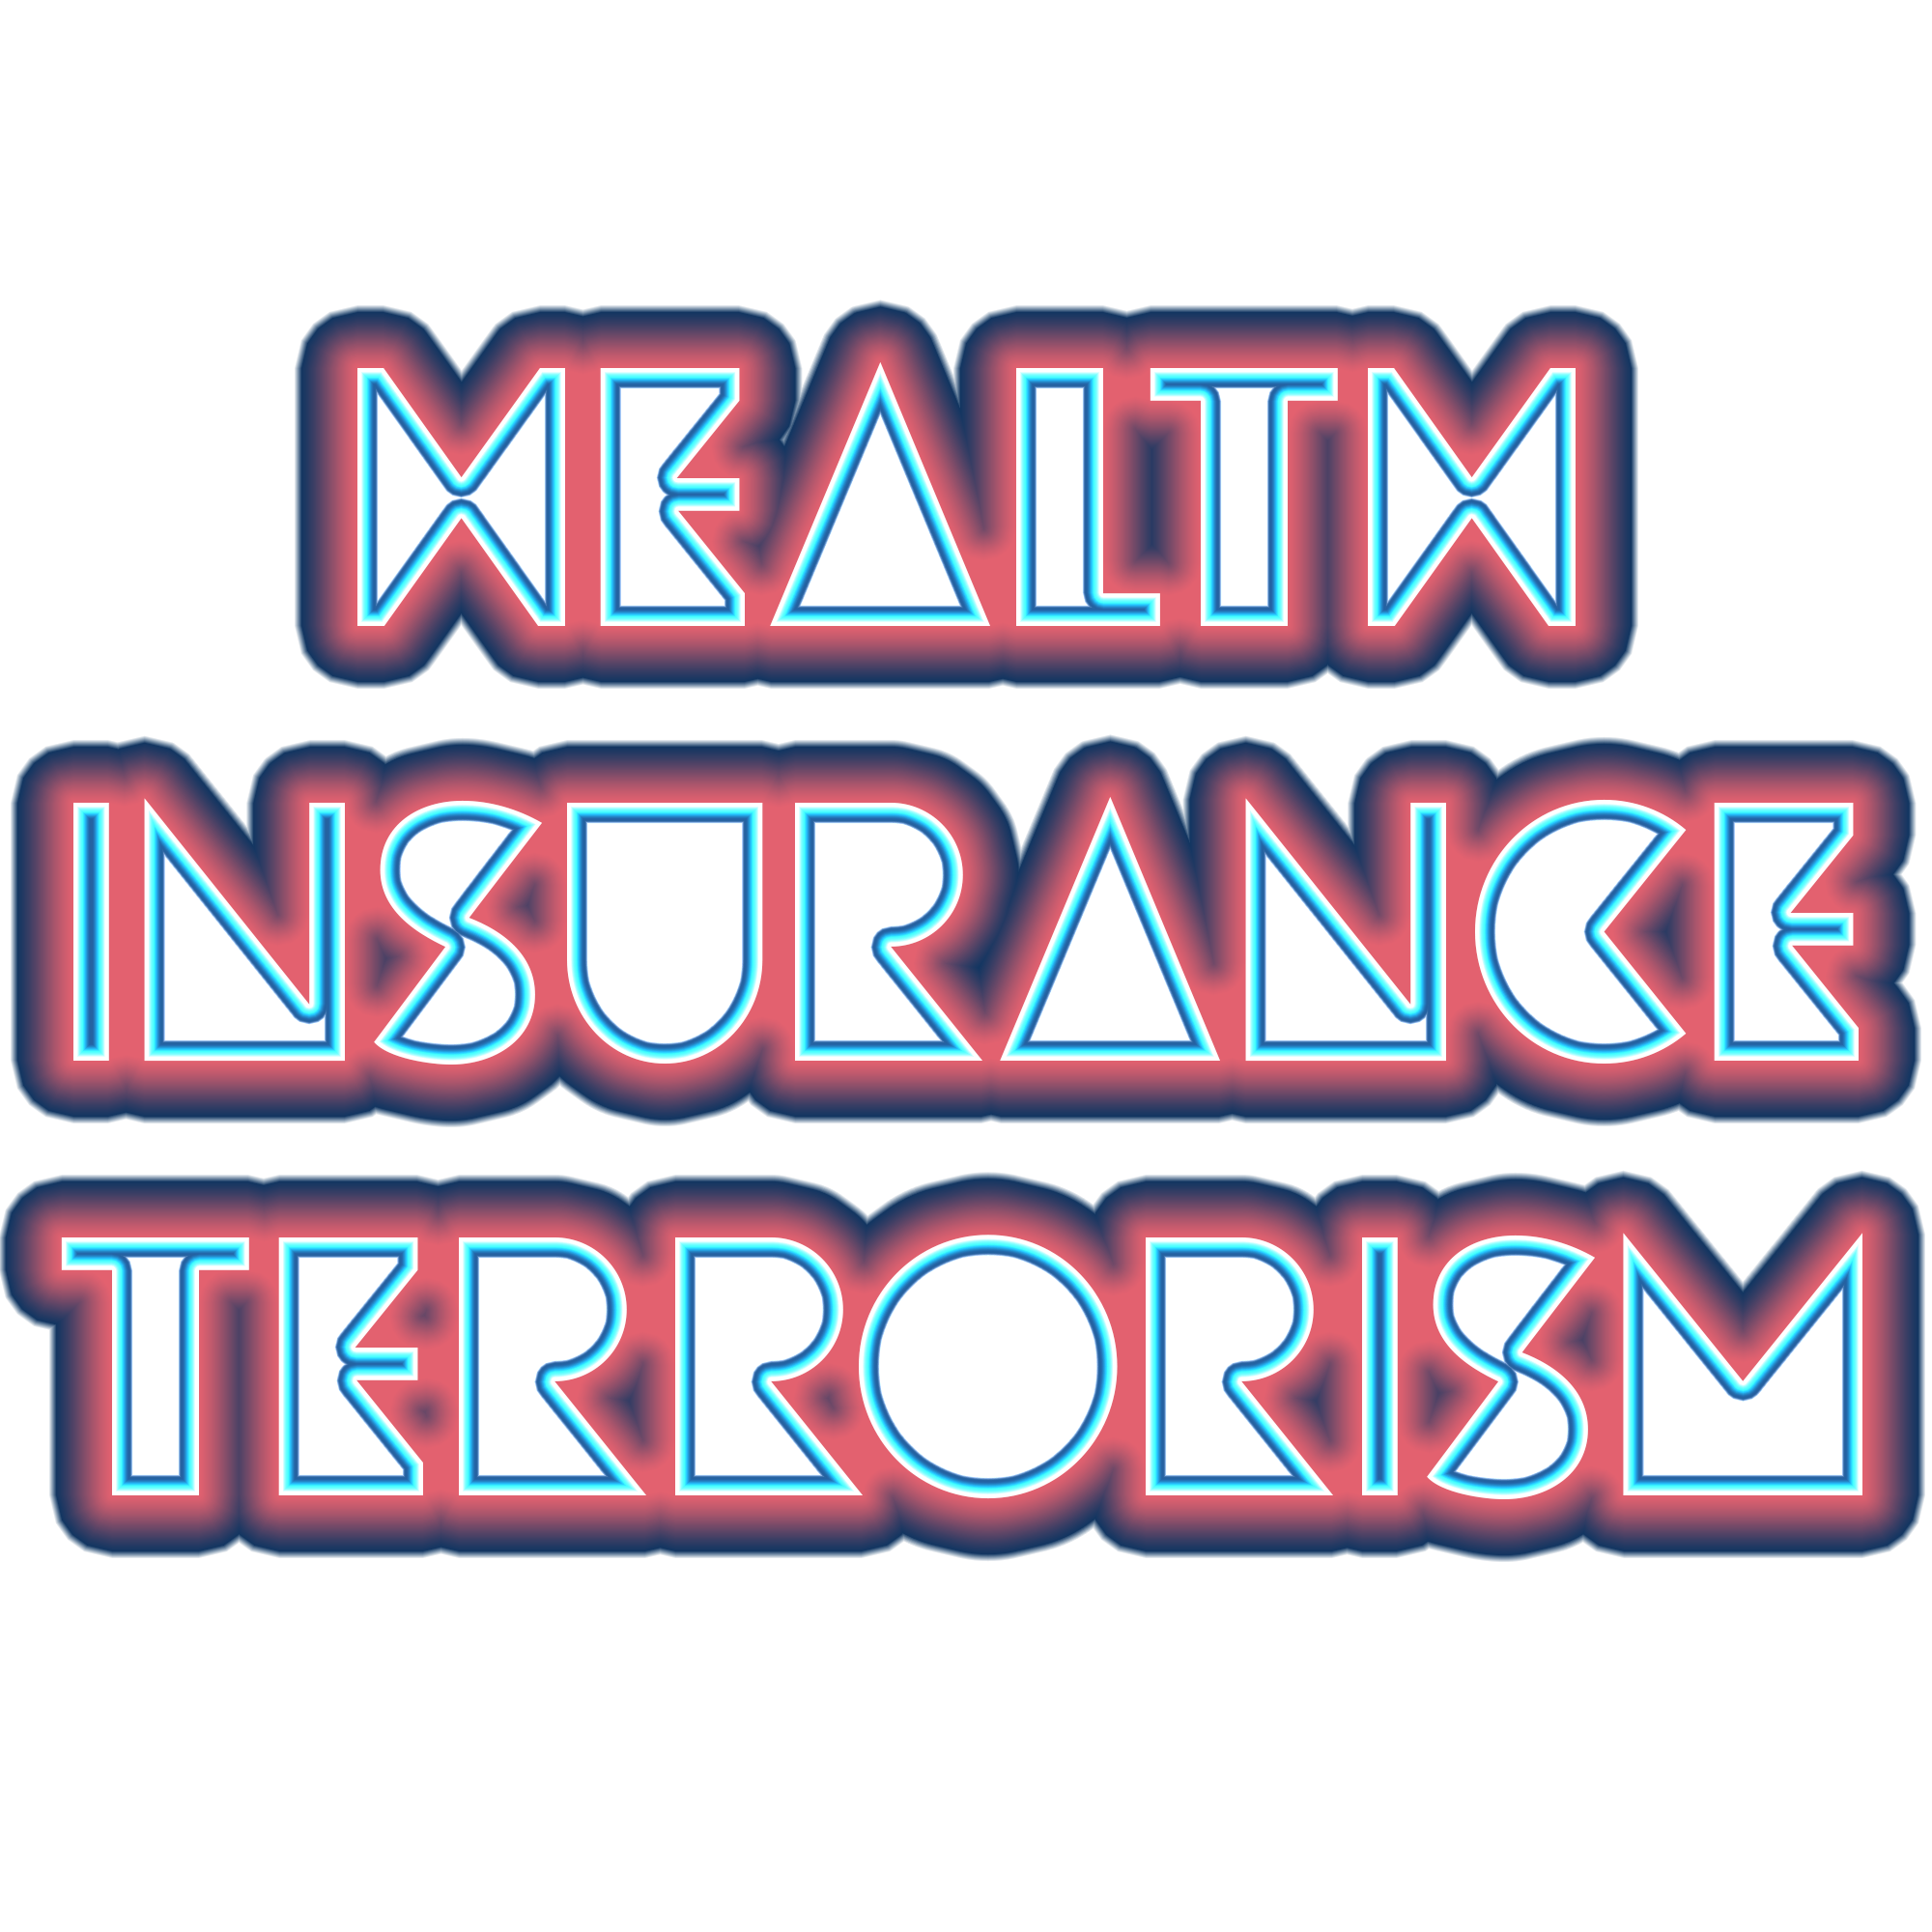 HealthInsuranceTerrorism.png